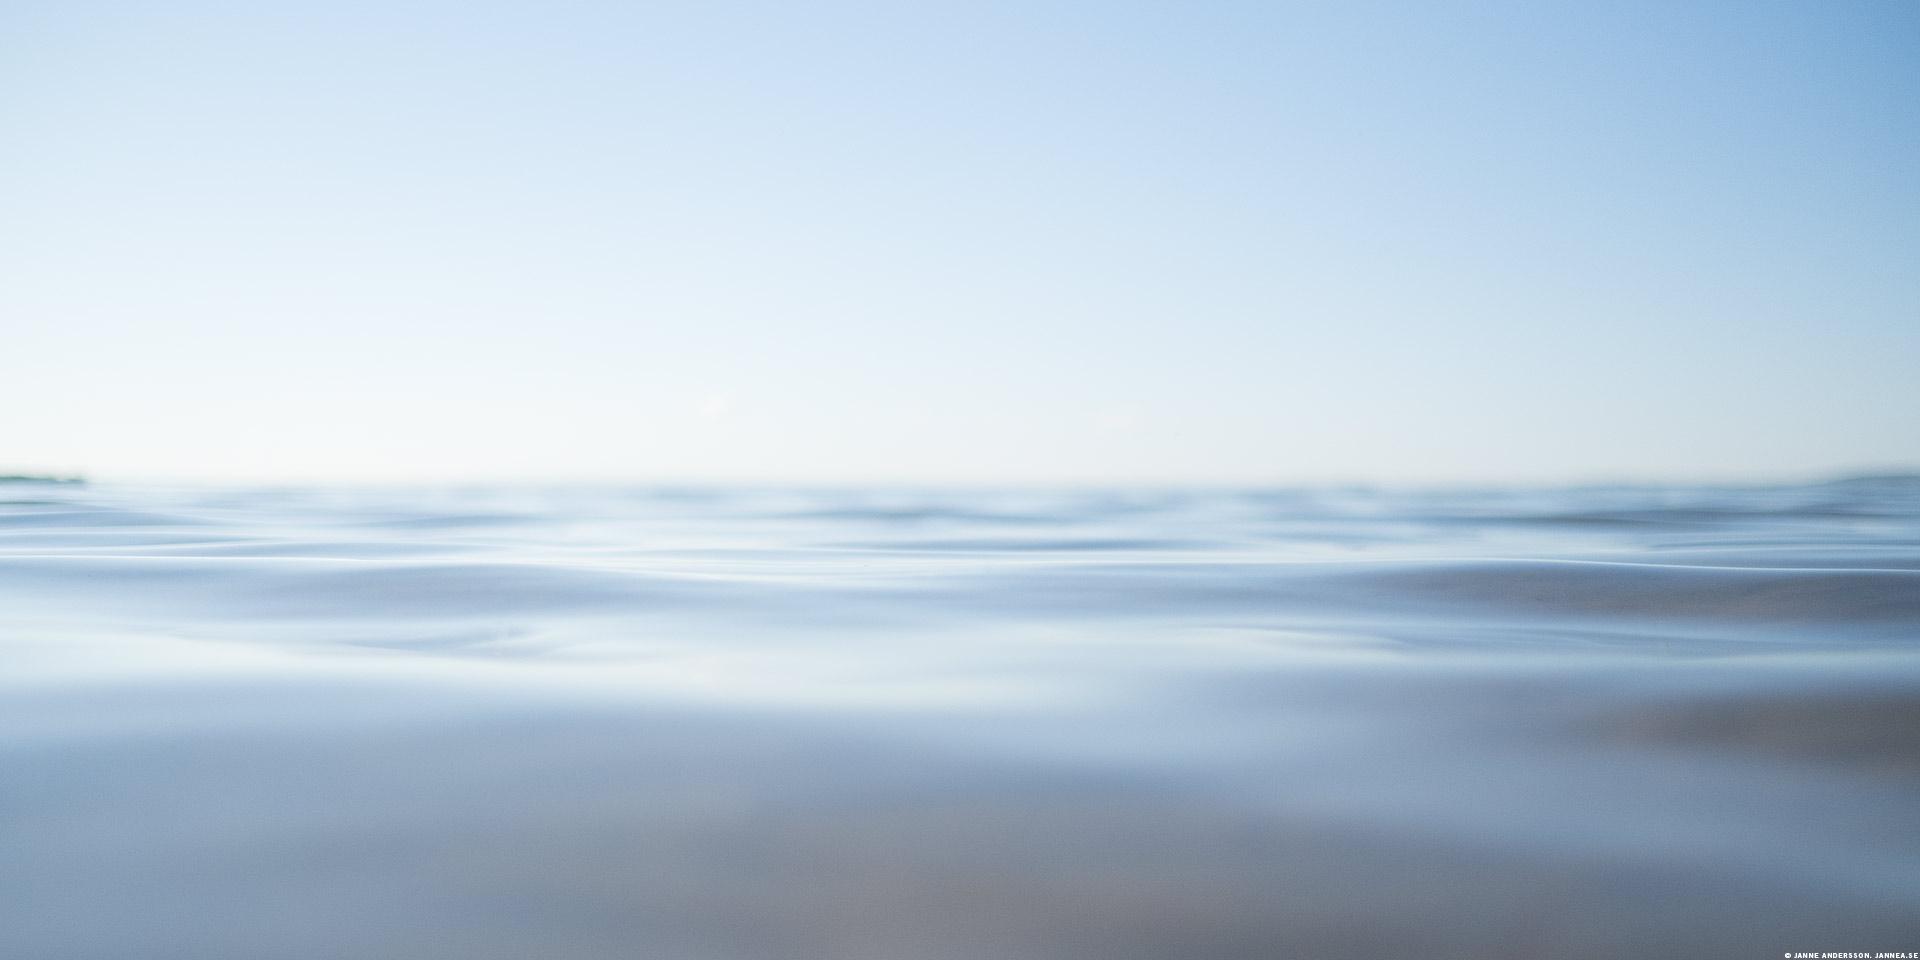 Veckans Vättern och skvalpande vatten |©Janne A